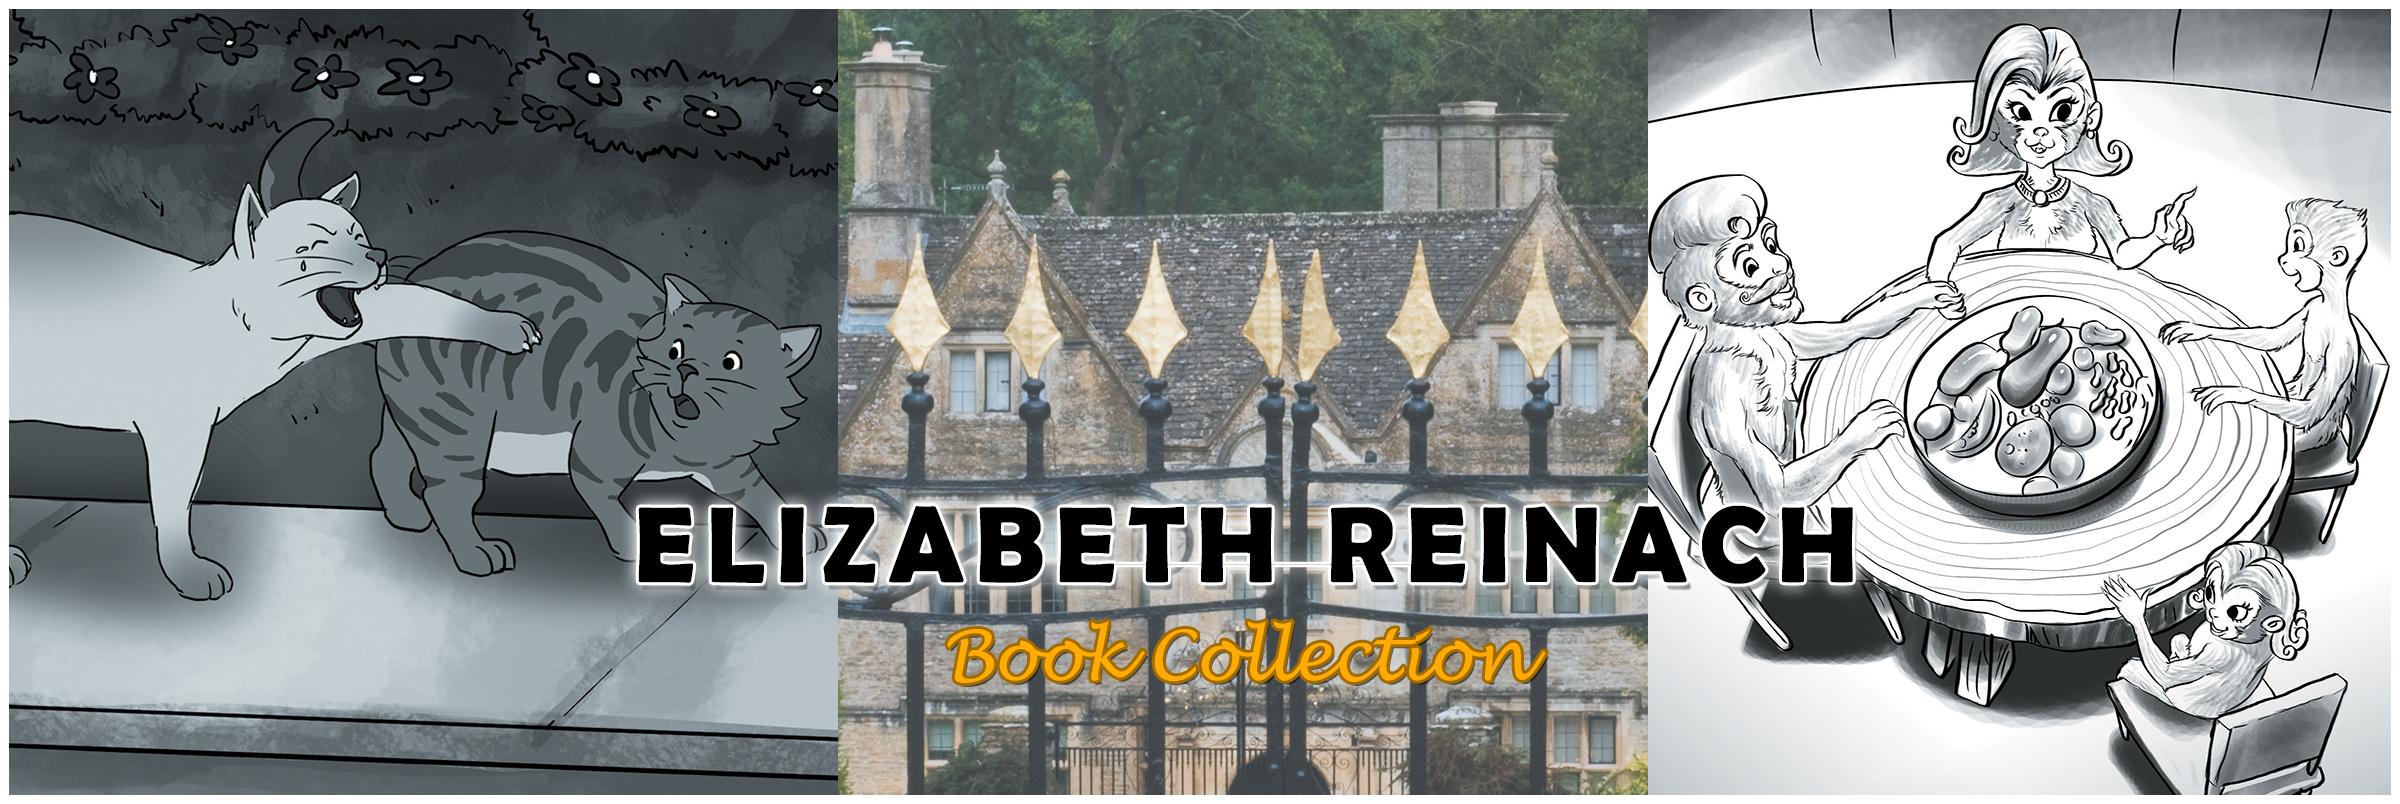 Elizabeth Reinach's books